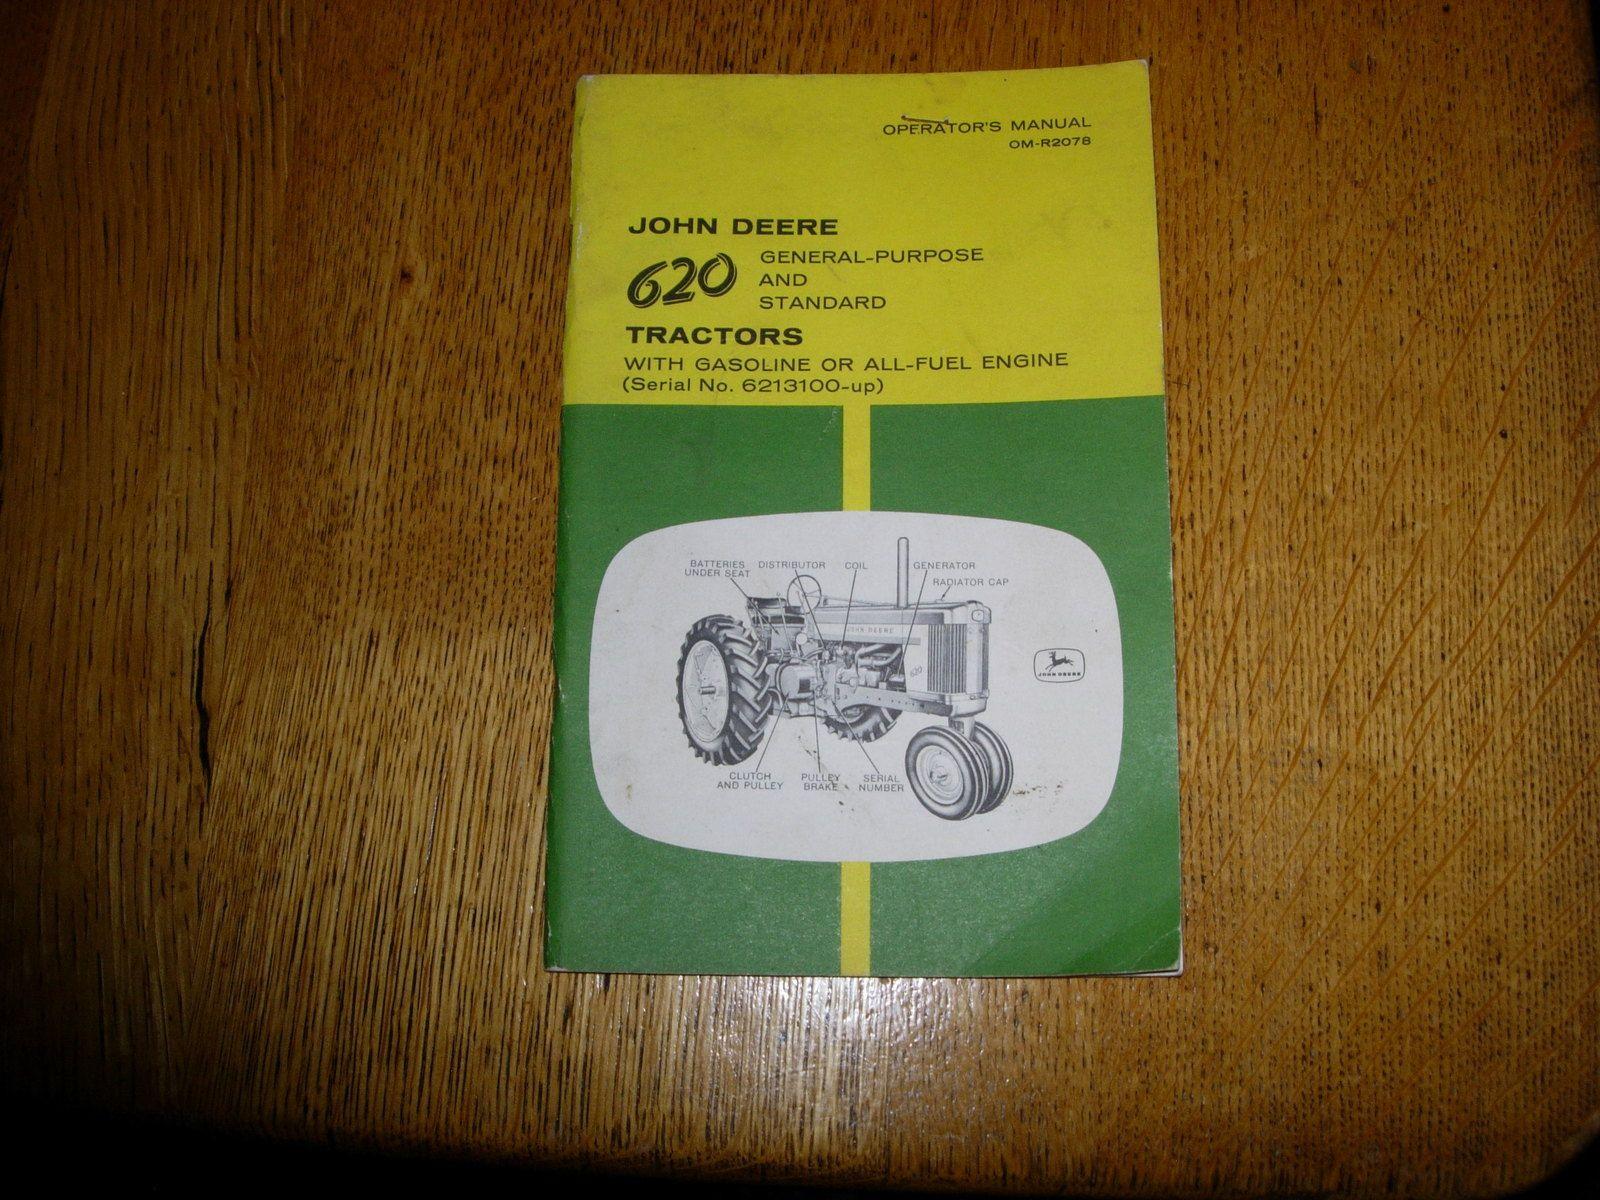 John Deere 620 Operators manual